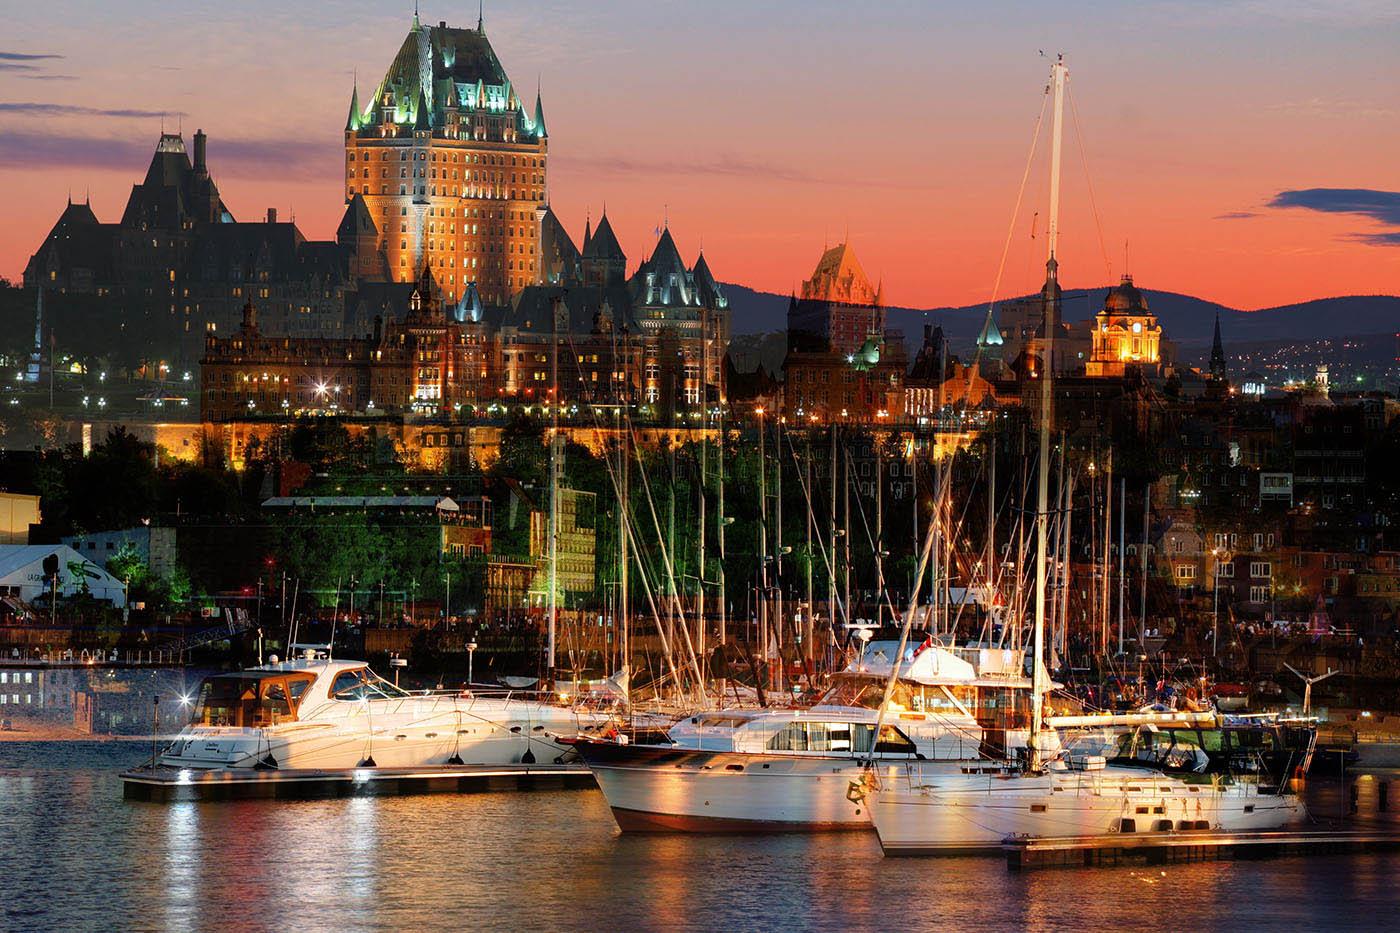 Quebec City Marina - Royalty-Free Stock Imagery